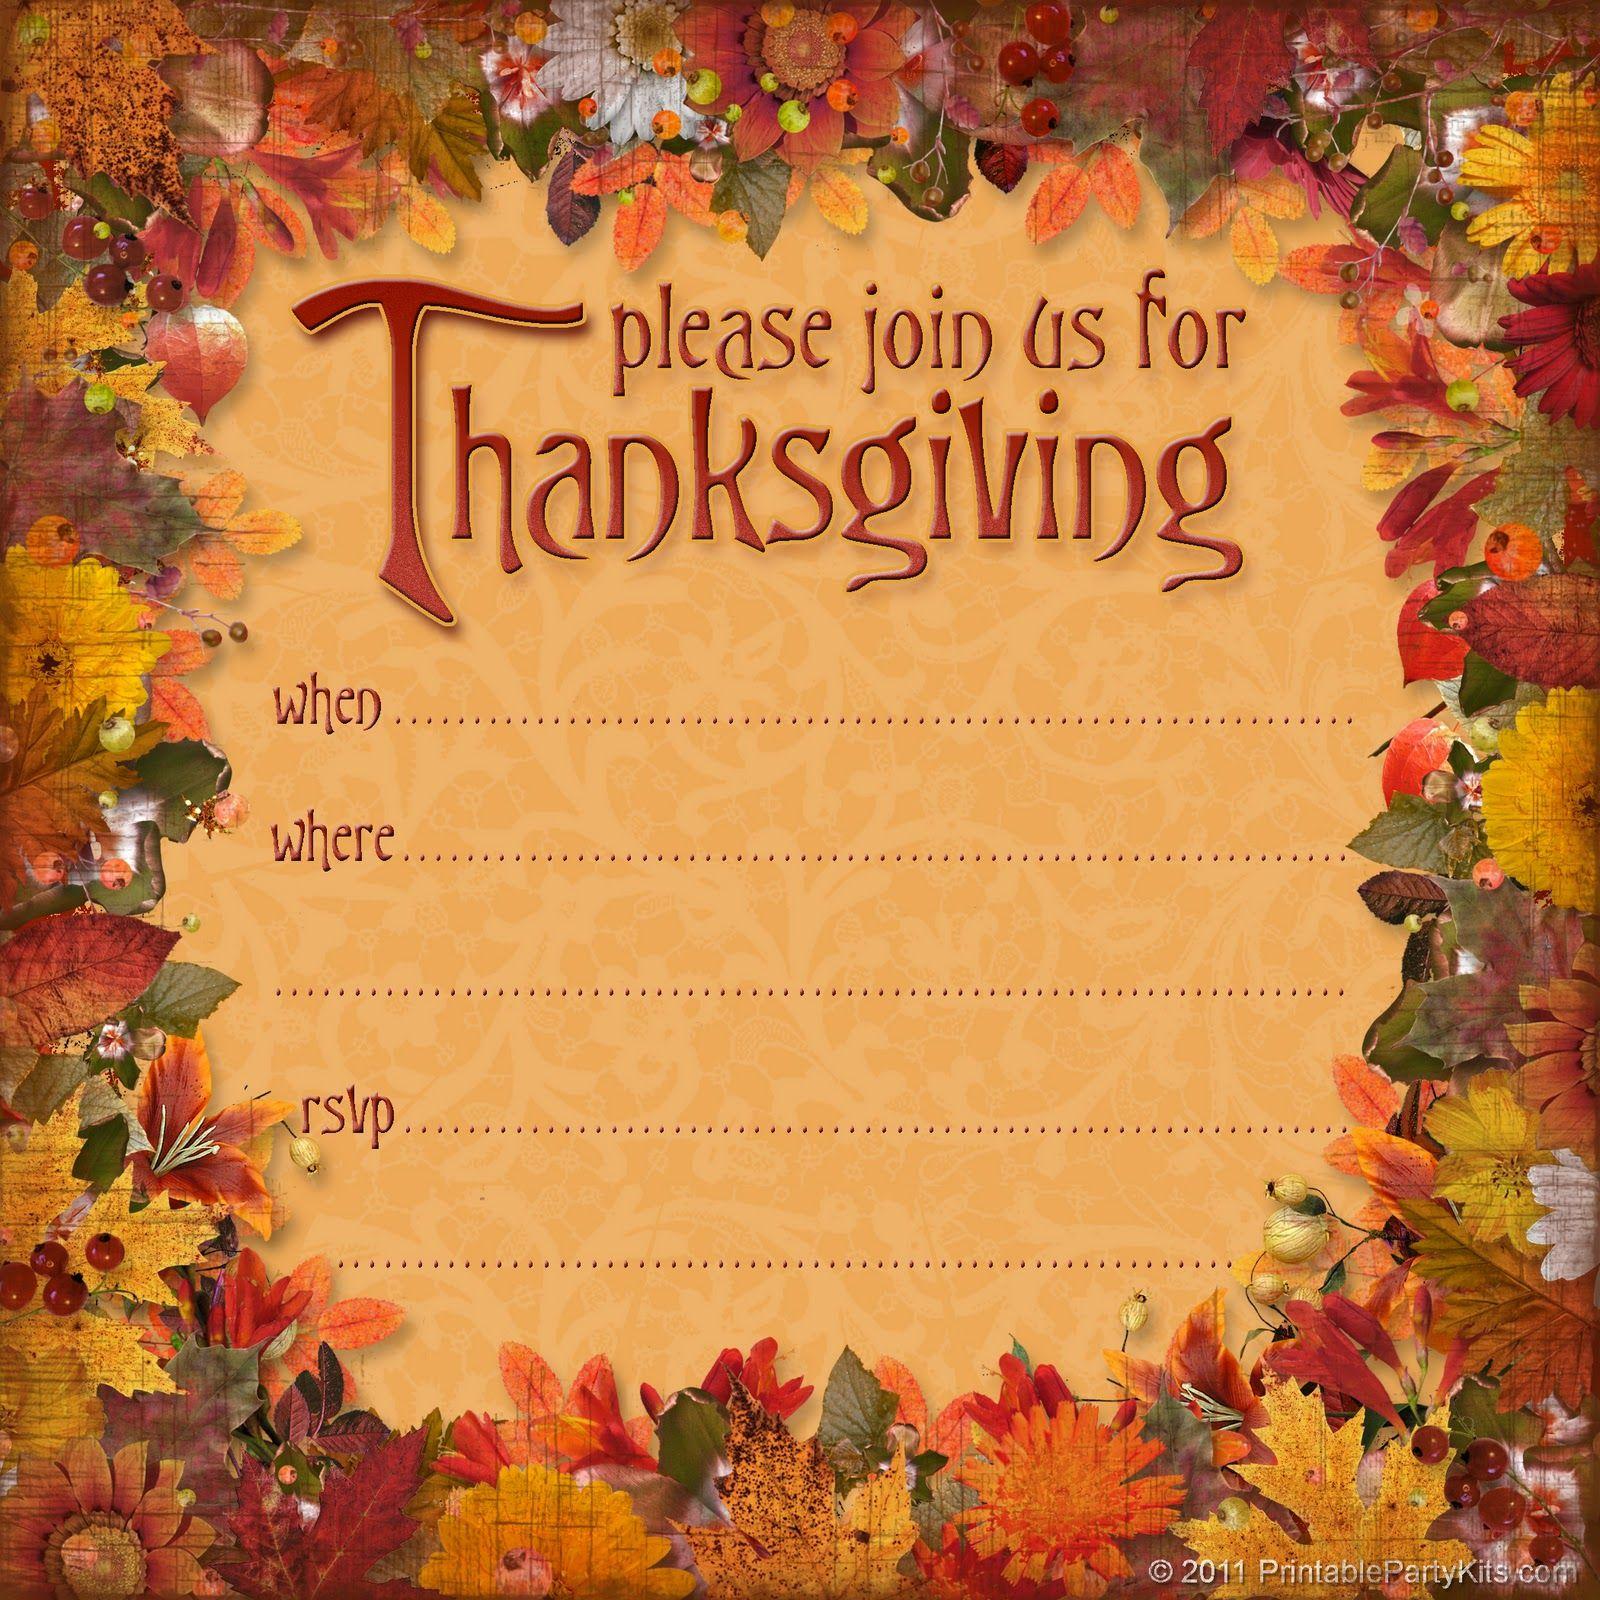 Printable Thanksgiving Invitations Templates | Craft Ideas I like ...